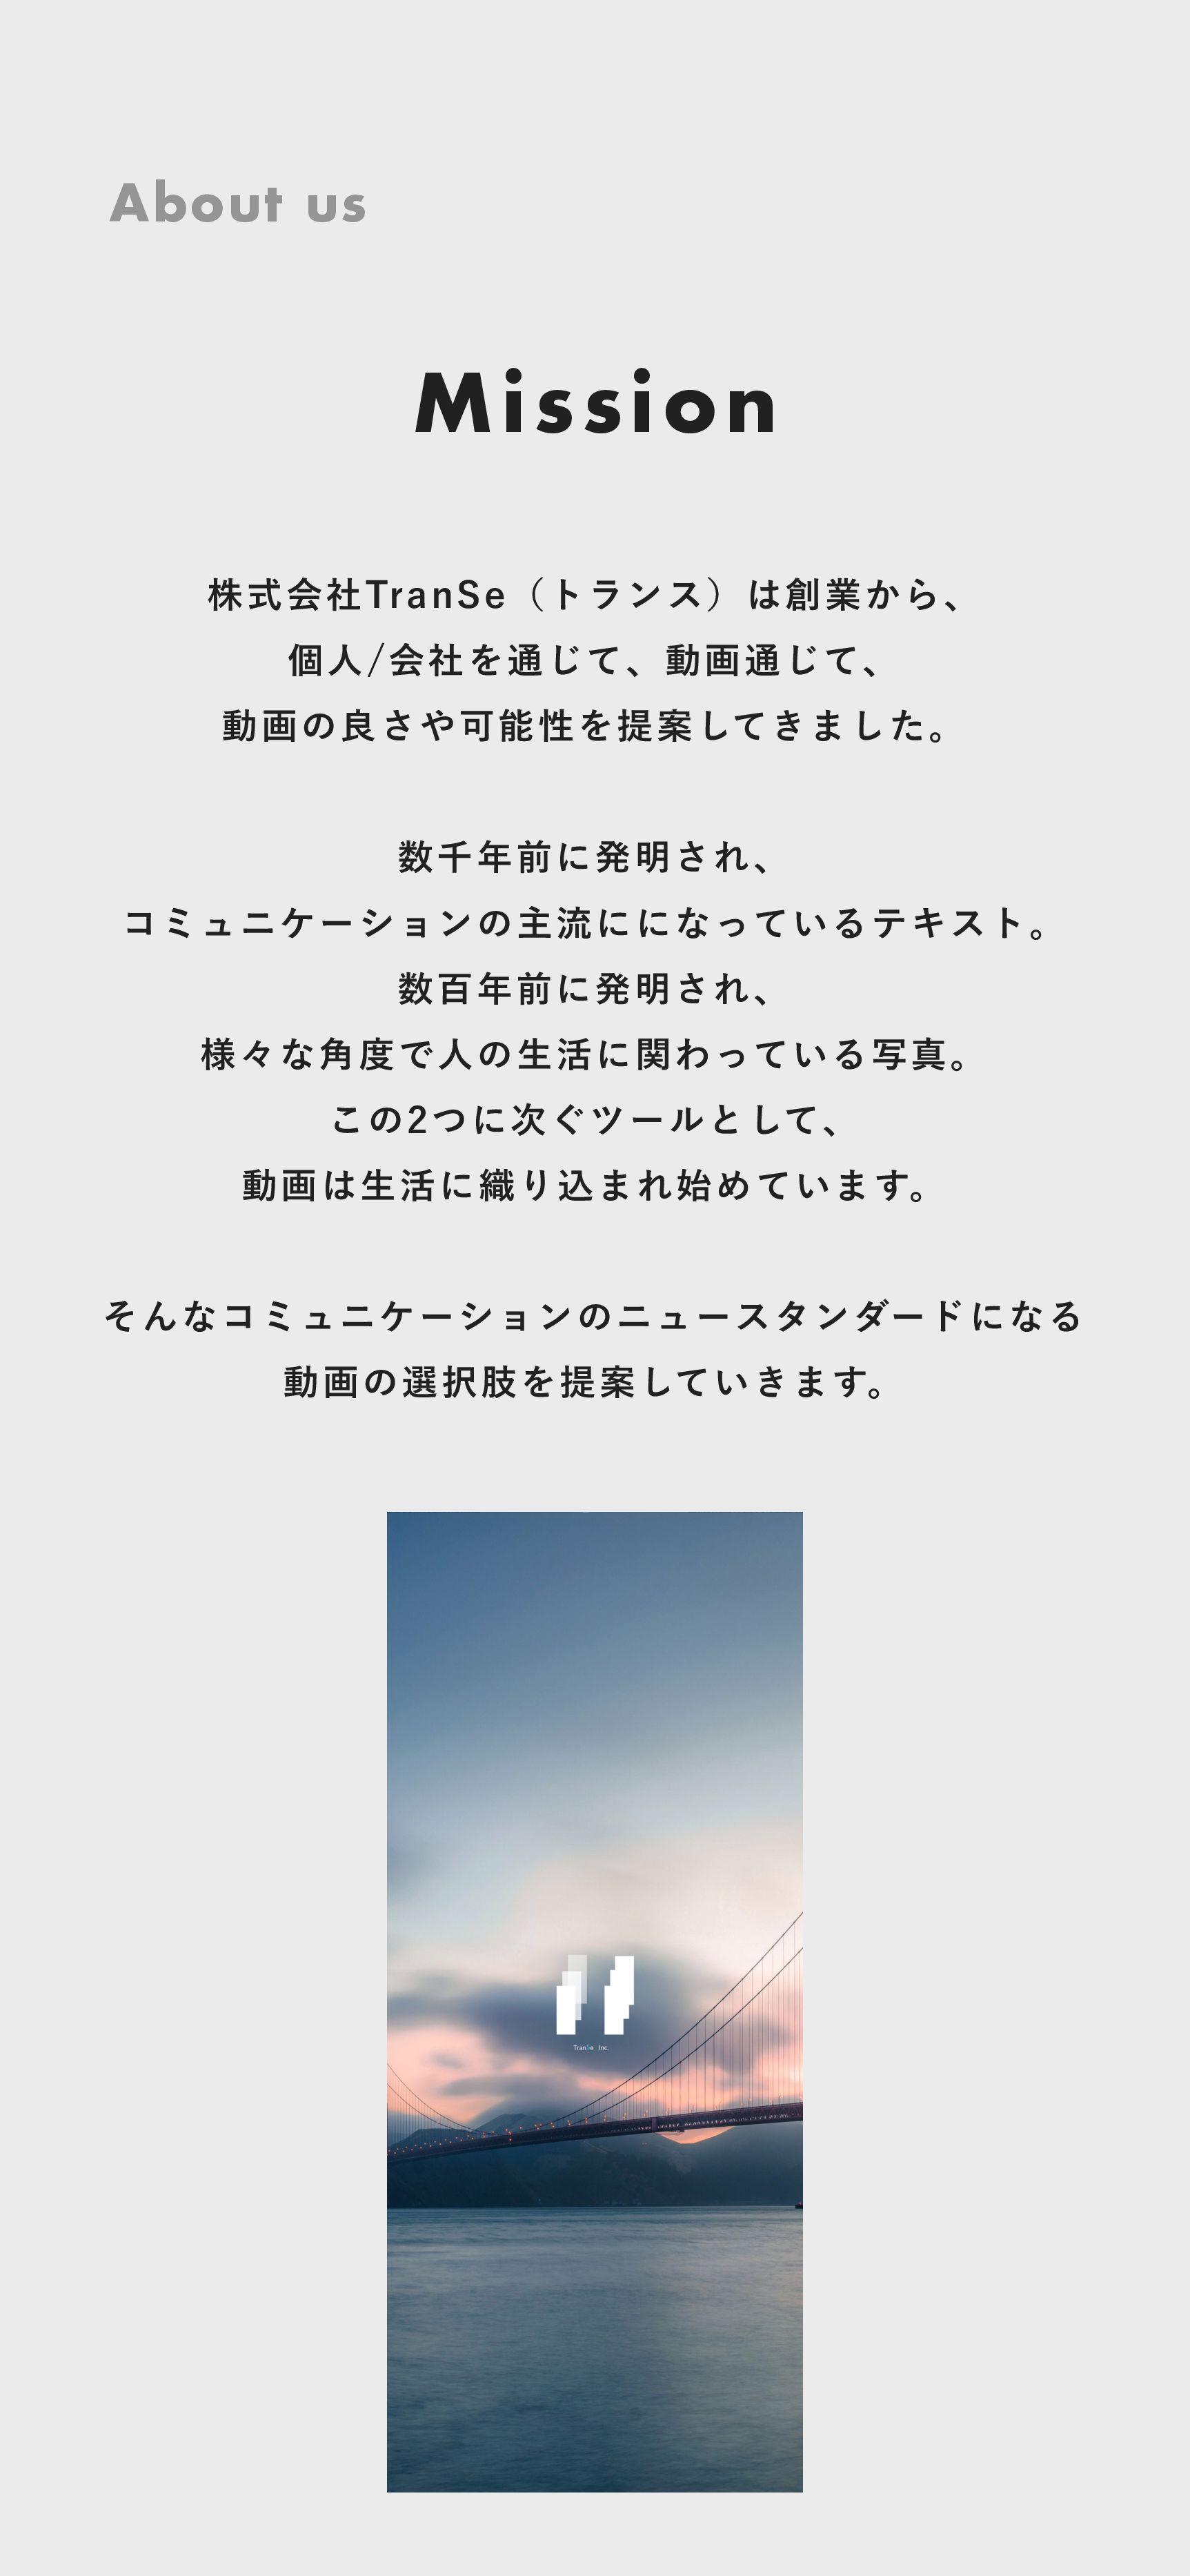 Mission גࣜձࣾ5SBO4Fʢτϥϯεʣۀ͔Βɺ ݸਓձࣾΛ௨ͯ͡ɺಈը௨ͯ͡...